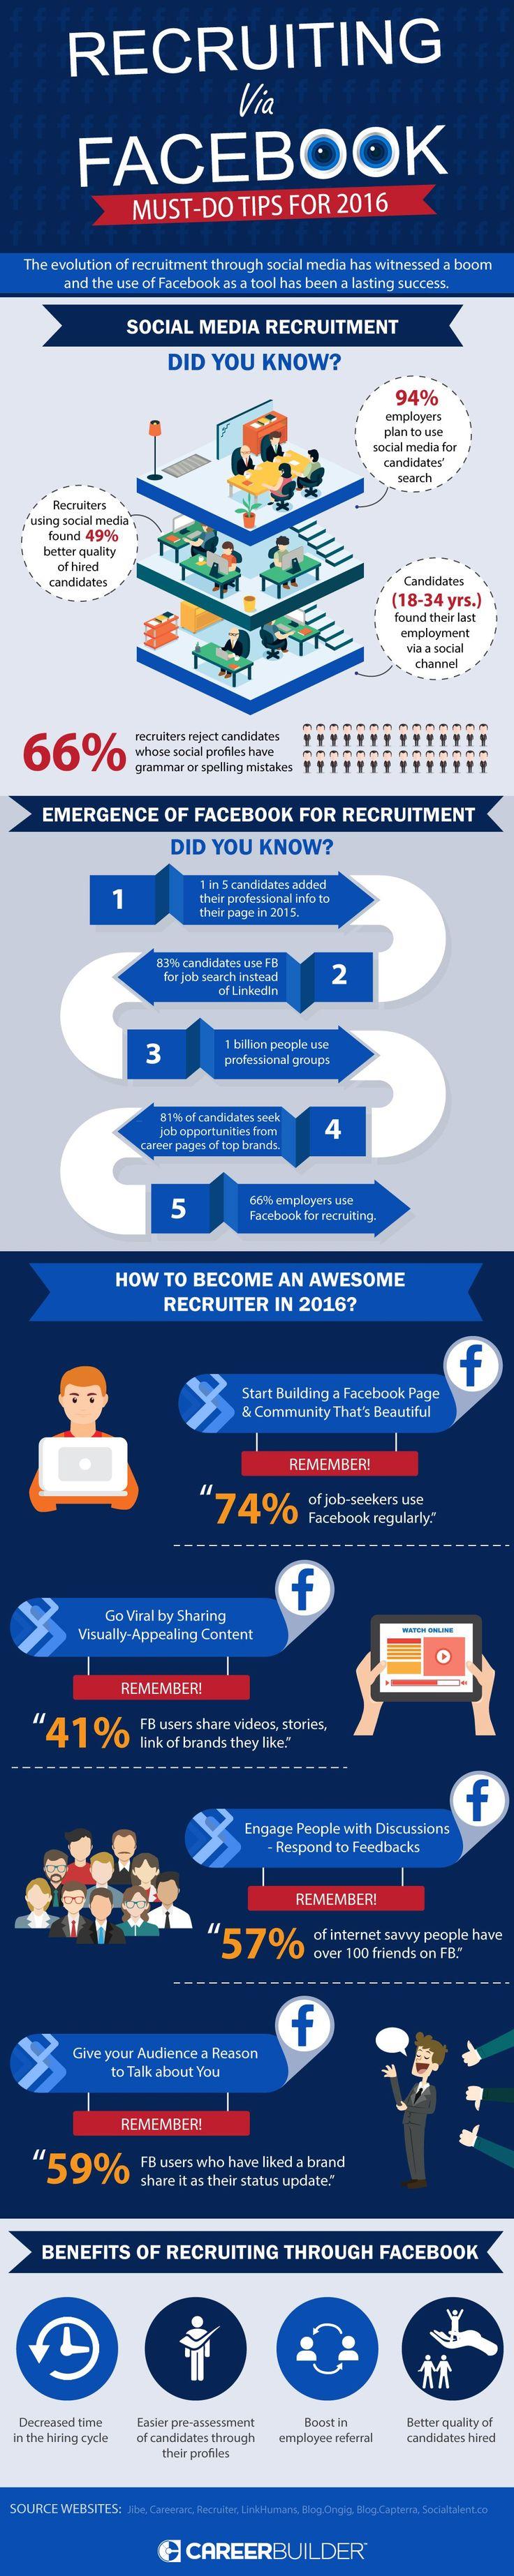 CareerBuilder_Sourcing-through-facebook